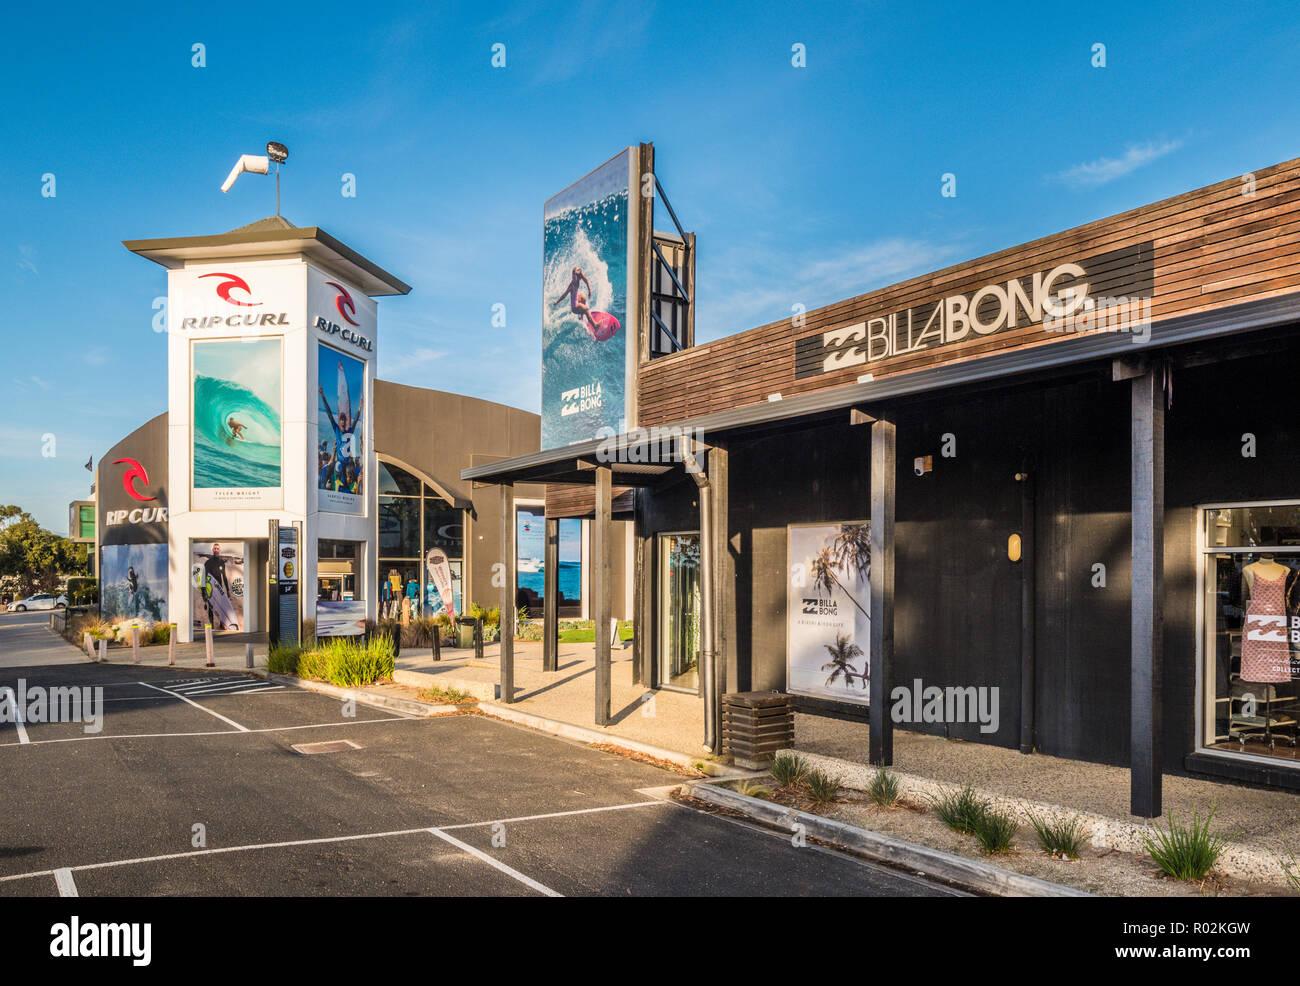 Rip Curl and Billabong surf shops at Surf Coast Plaza, Torquay, Surf Coast Shire, Great Ocean Road, Victoria, Australia. - Stock Image